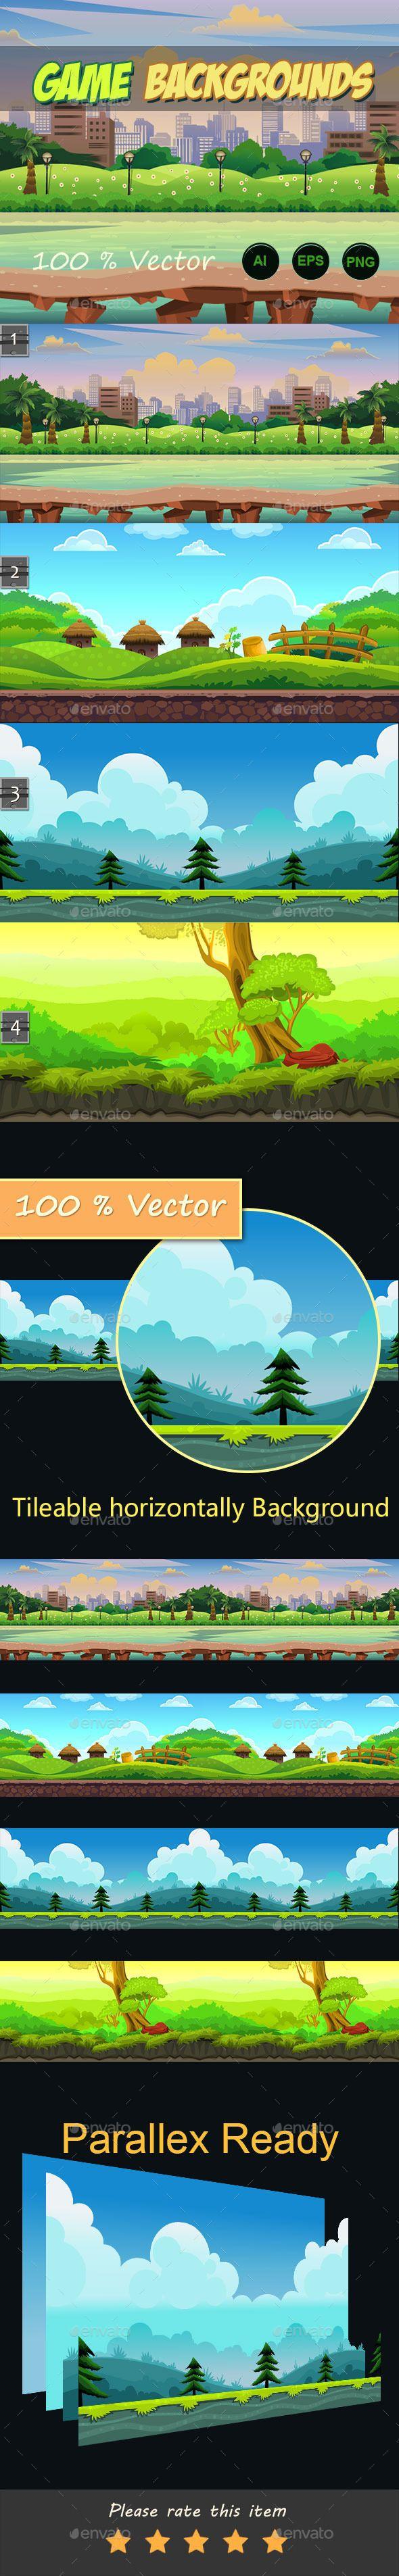 4 game backgrounds Download here: https://graphicriver.net/item/4-game-backgrounds/11109392?ref=KlitVogli